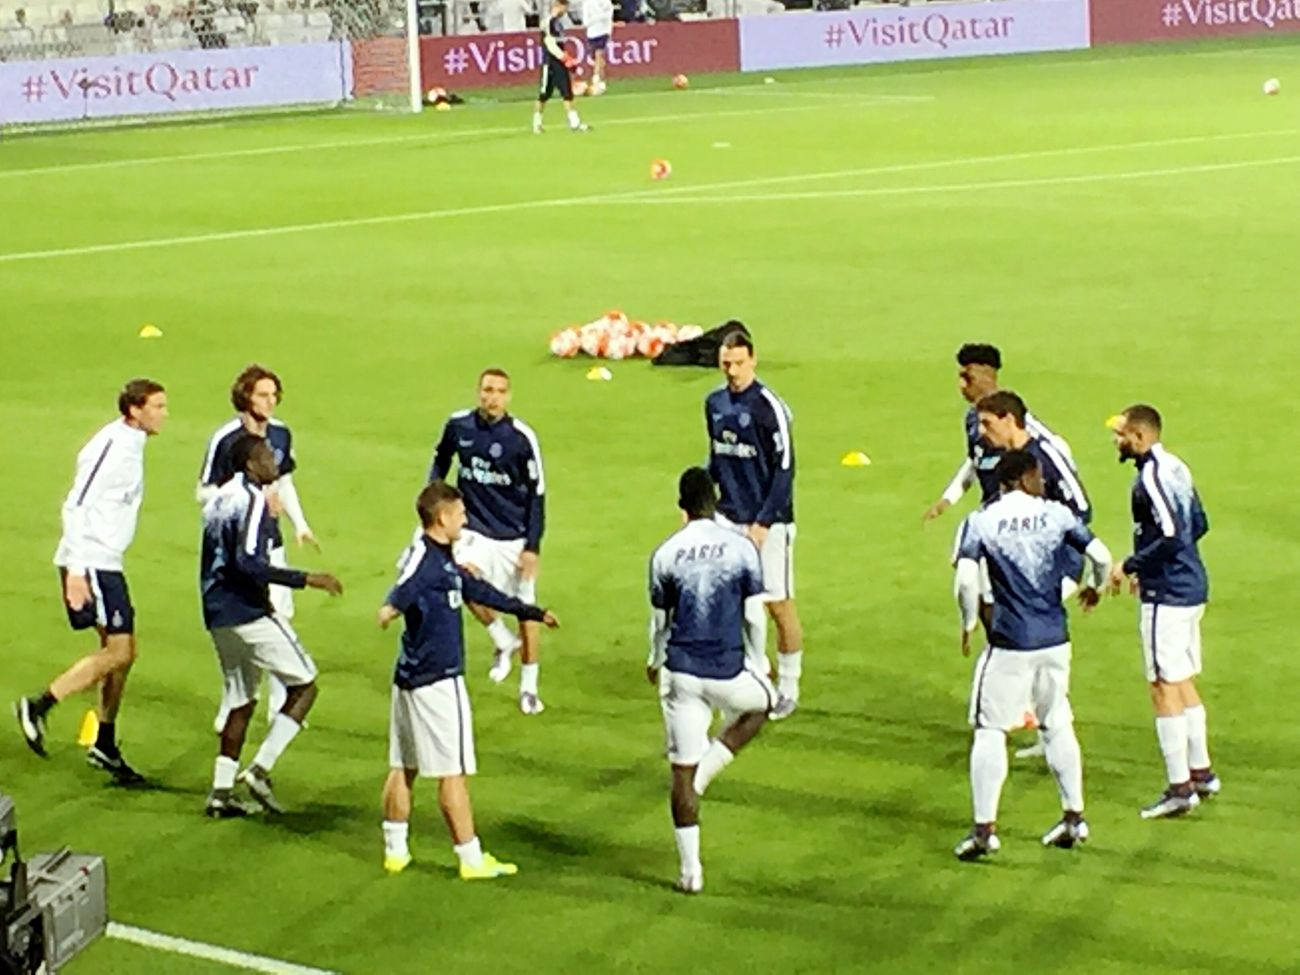 Paris Saint Germain Zlatan Ibrahimovic Marco Verratti warm up before match. Never felt it's a friendly match. Keep going PSG!!!!